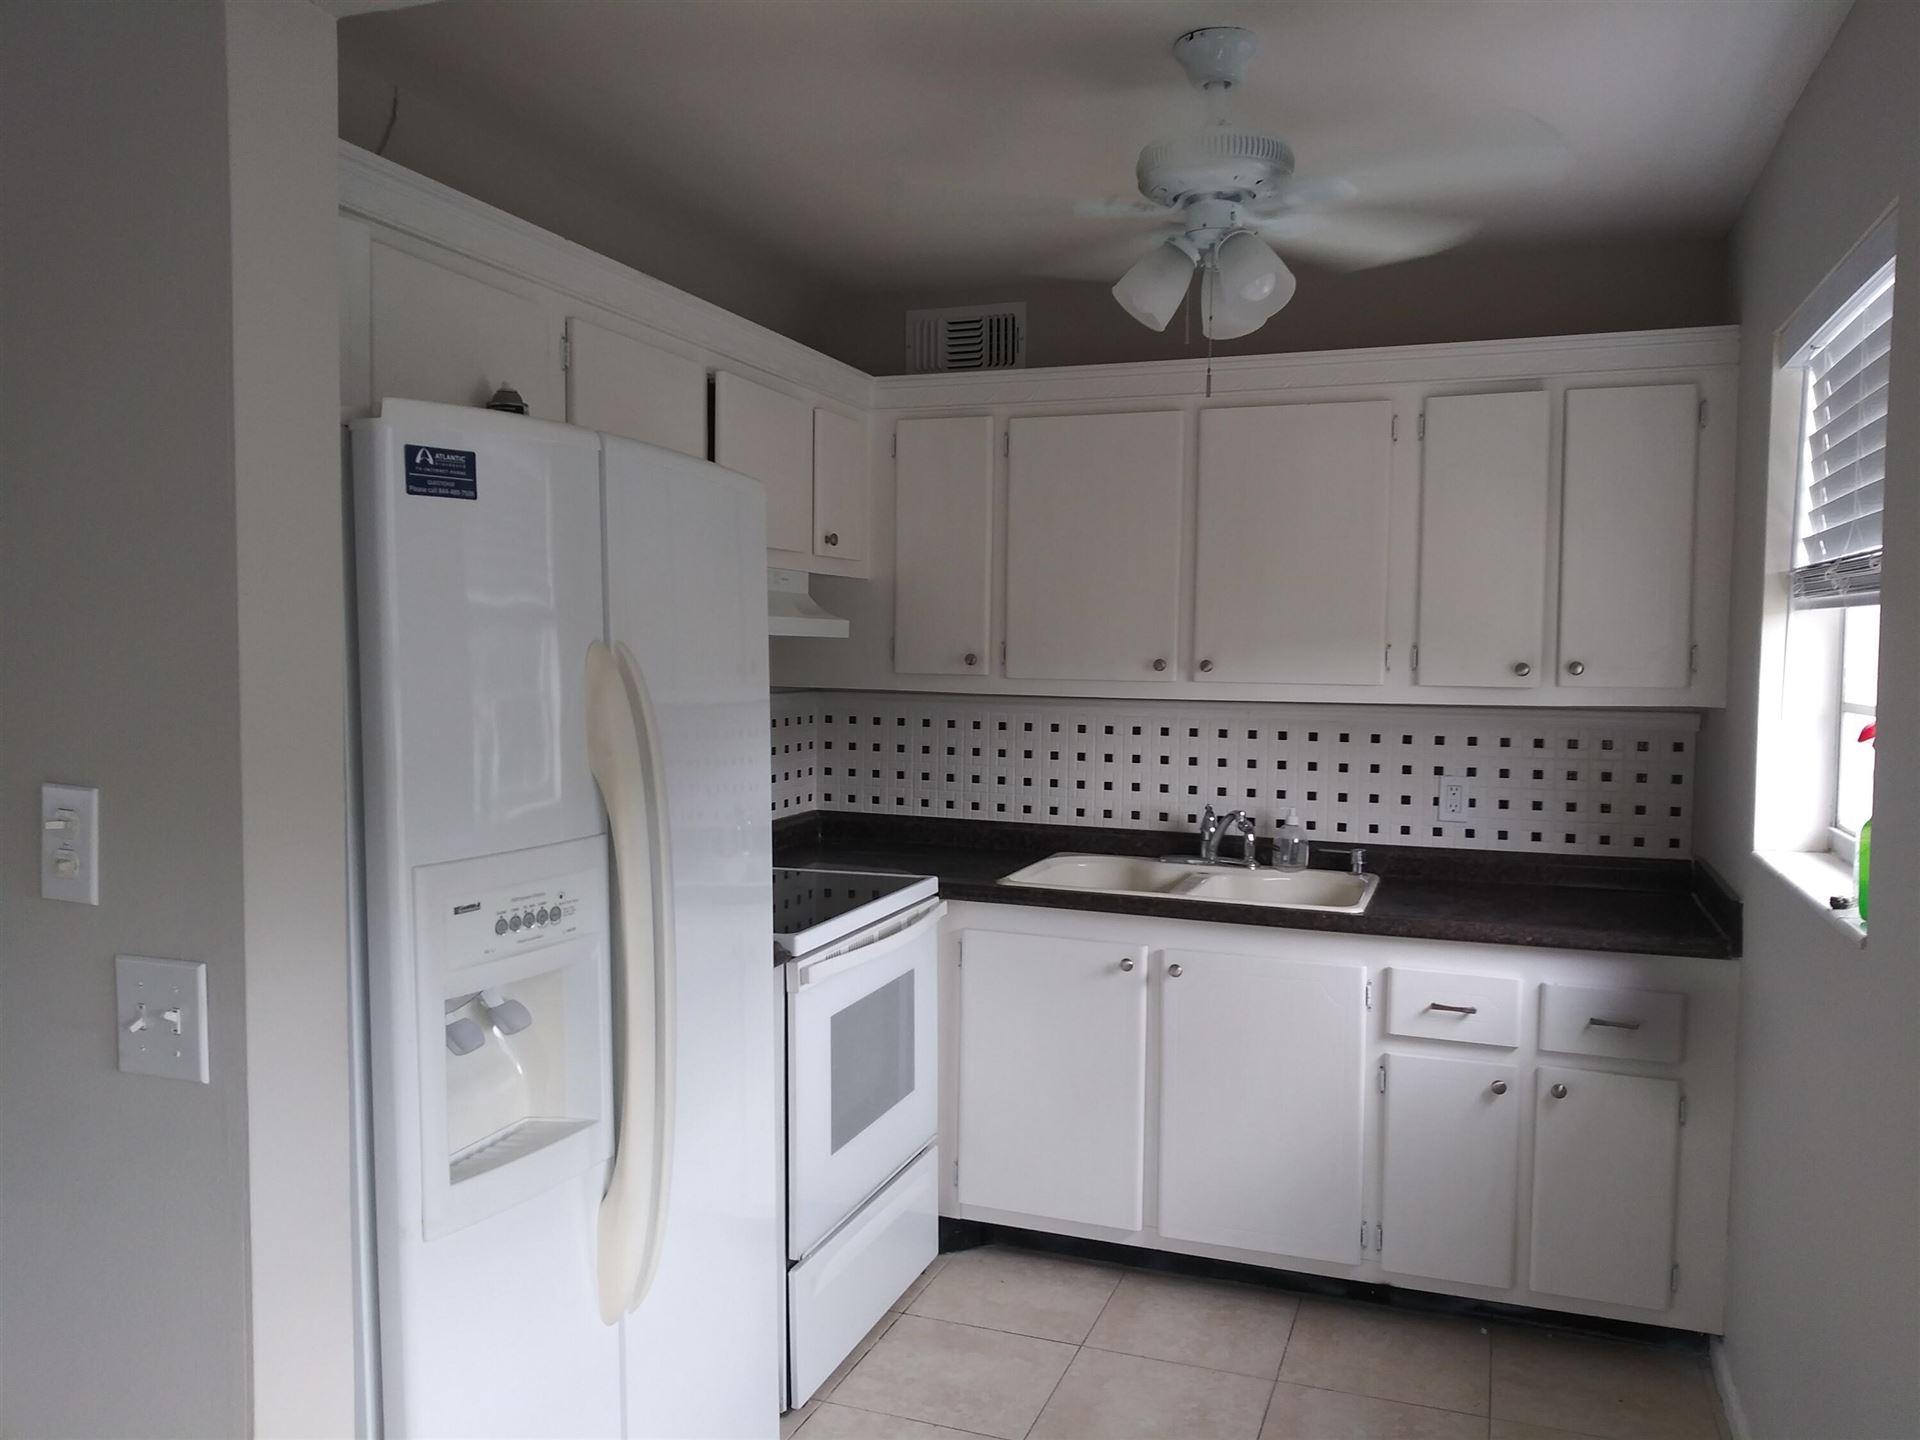 215 Kent #M, West Palm Beach, FL 33417 - MLS#: RX-10703303